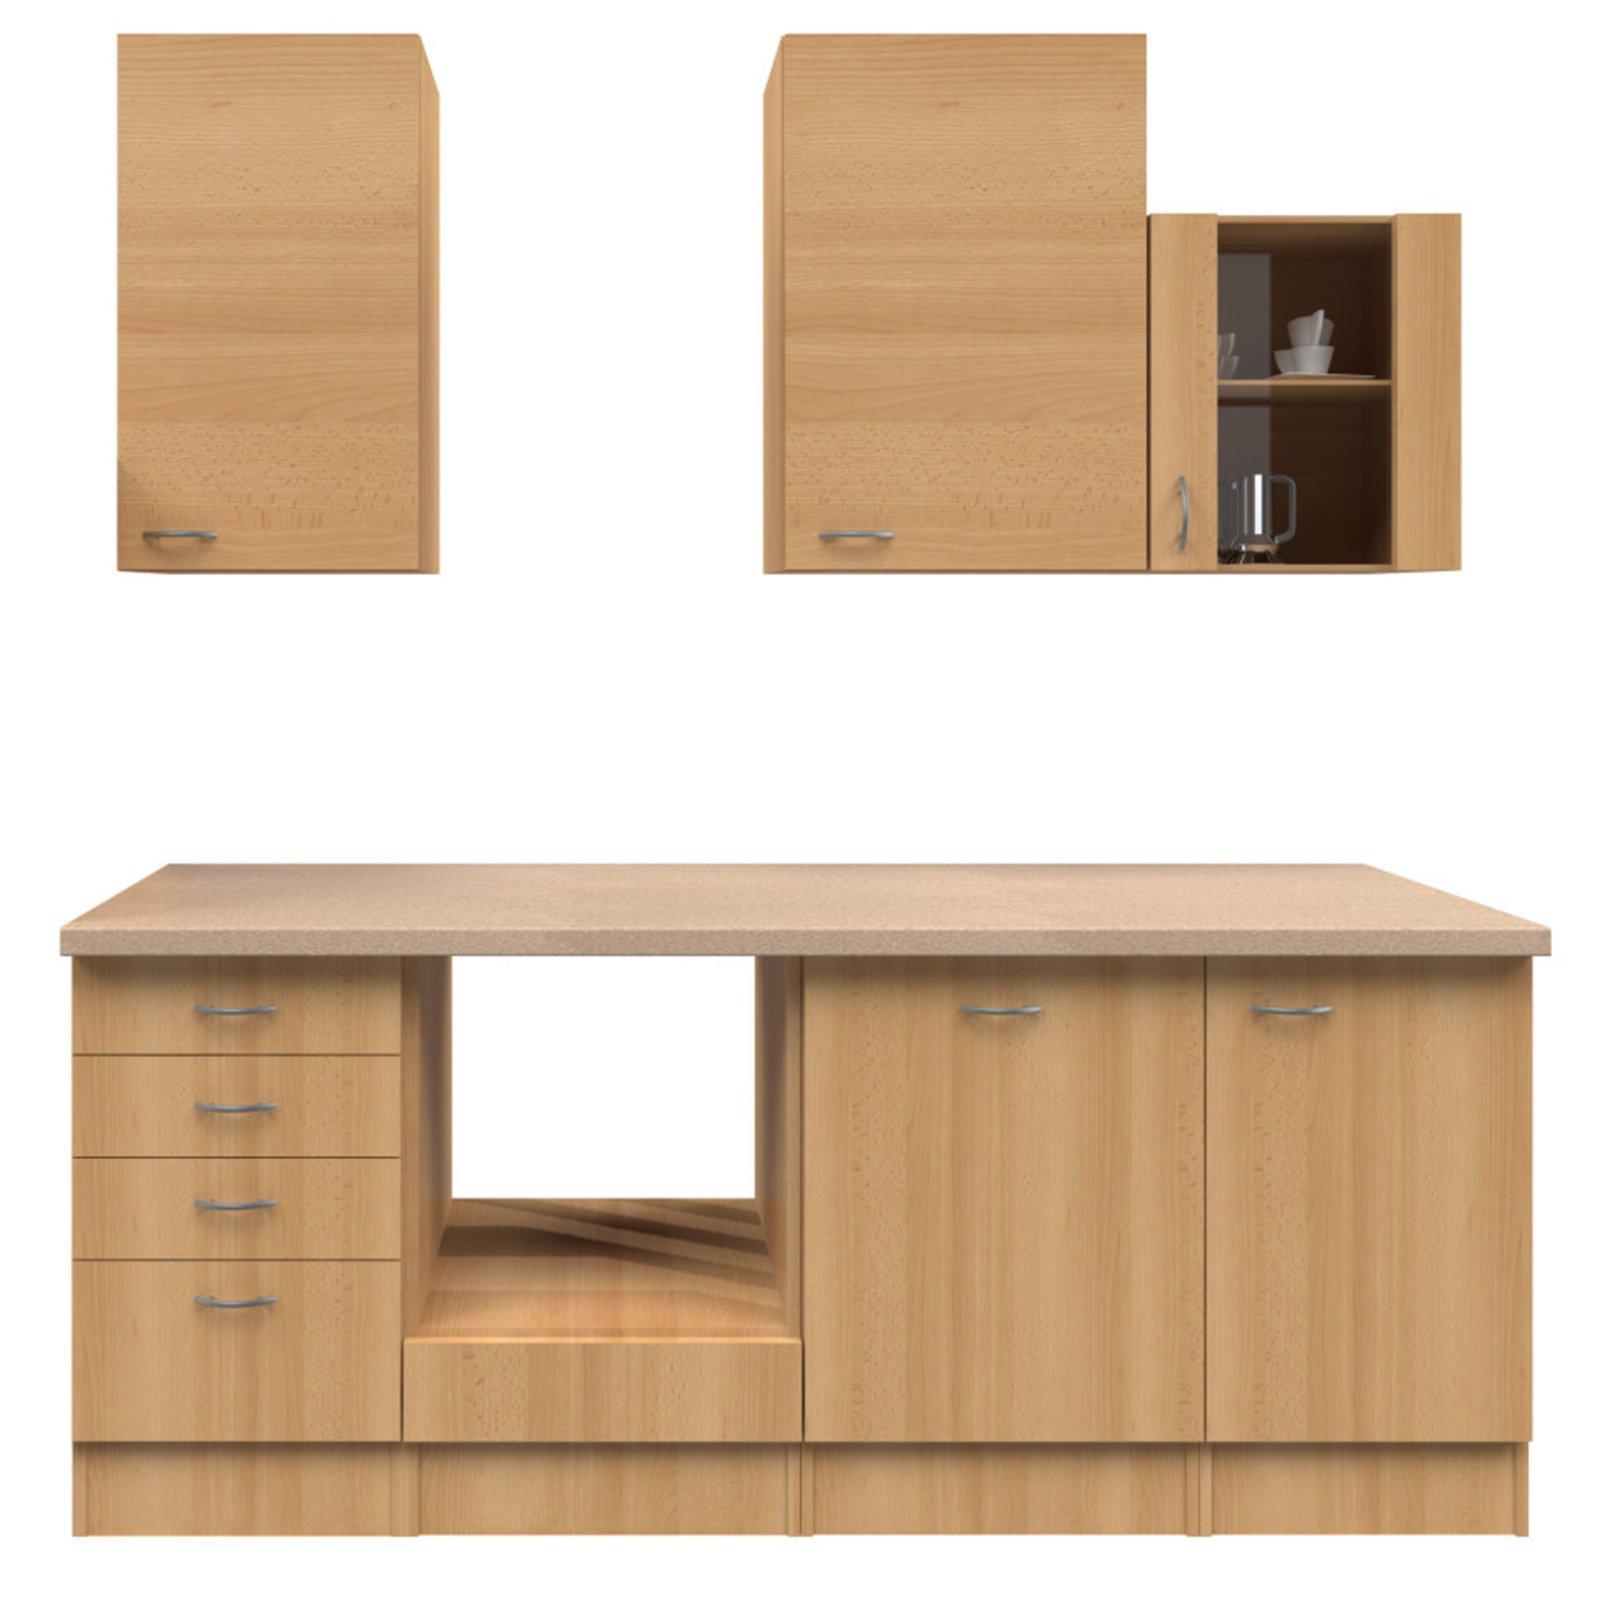 k chenblock nano buche 220 cm k chenzeilen ohne e ger te k chenzeilen m bel roller. Black Bedroom Furniture Sets. Home Design Ideas